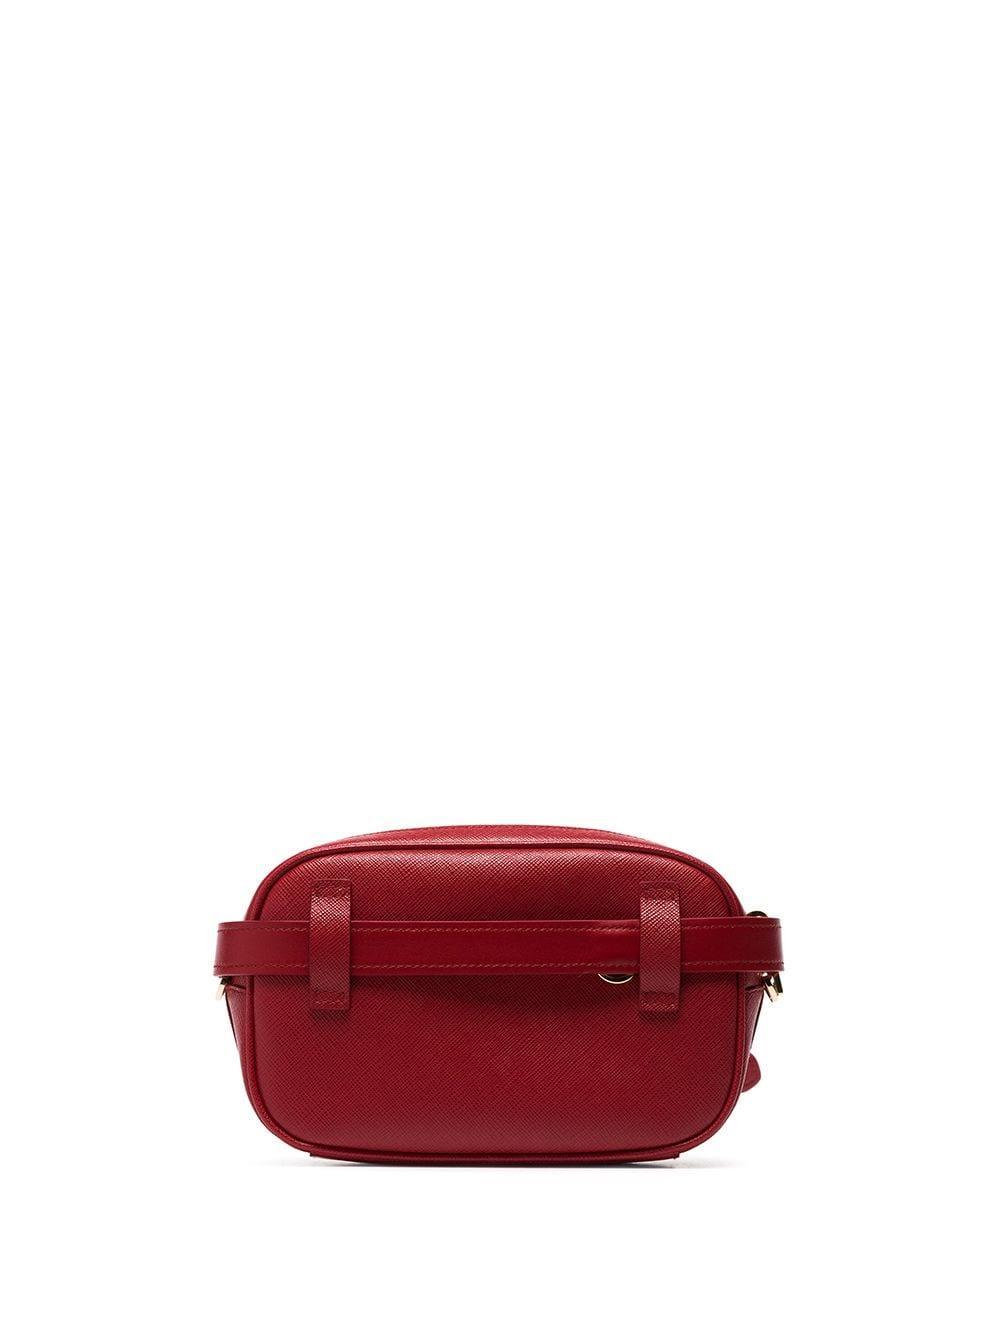 997b90b248de Prada - Red Chain-detail Leather Belt Bag - Lyst. View fullscreen